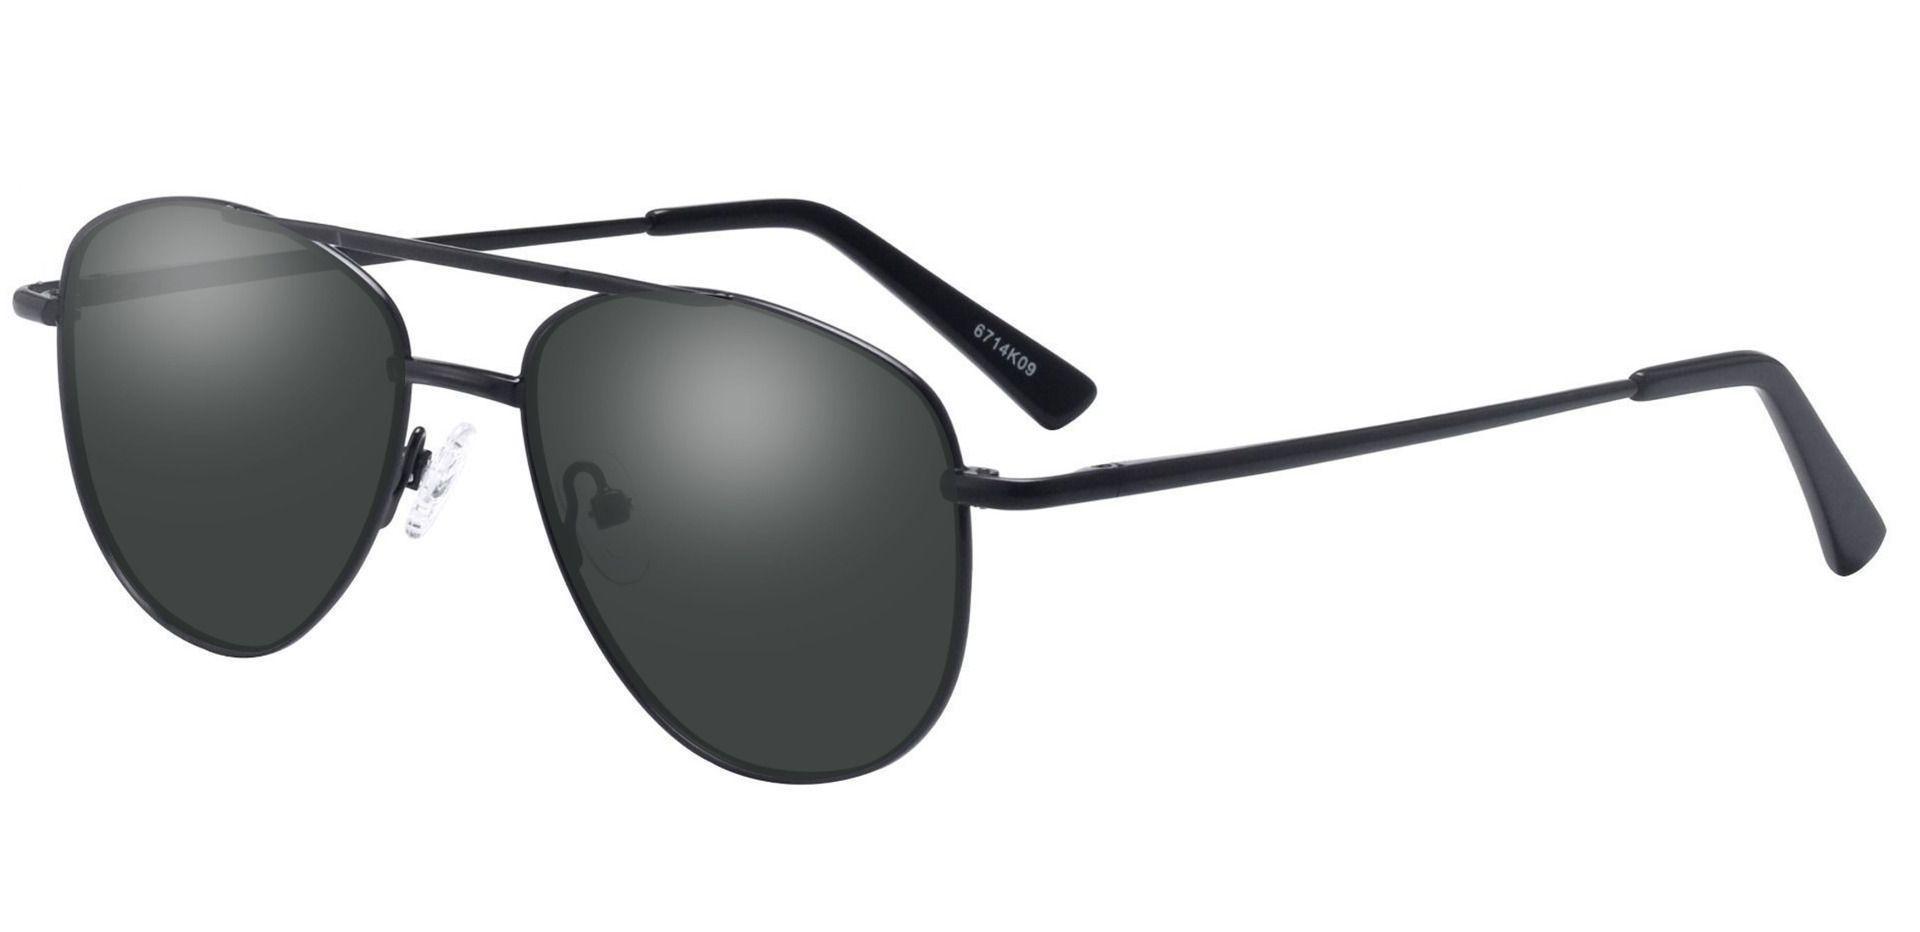 Dwight Aviator Prescription Sunglasses - Black Frame With Gray Lenses